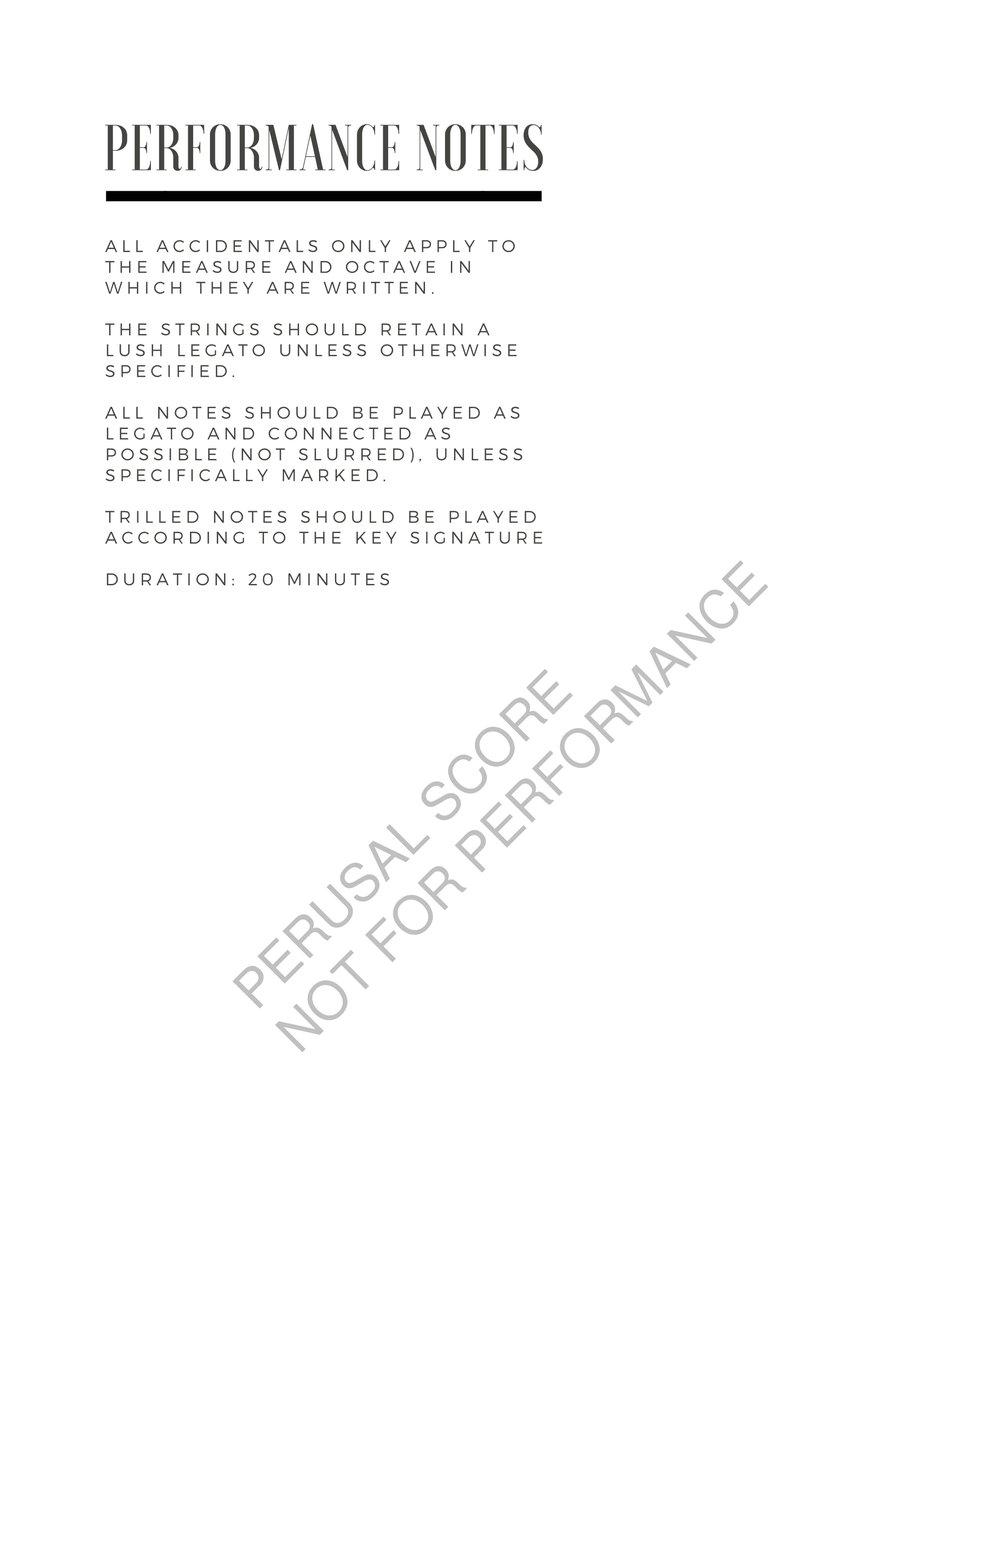 Boyd Sheltering Voices Score-watermark-06.jpg